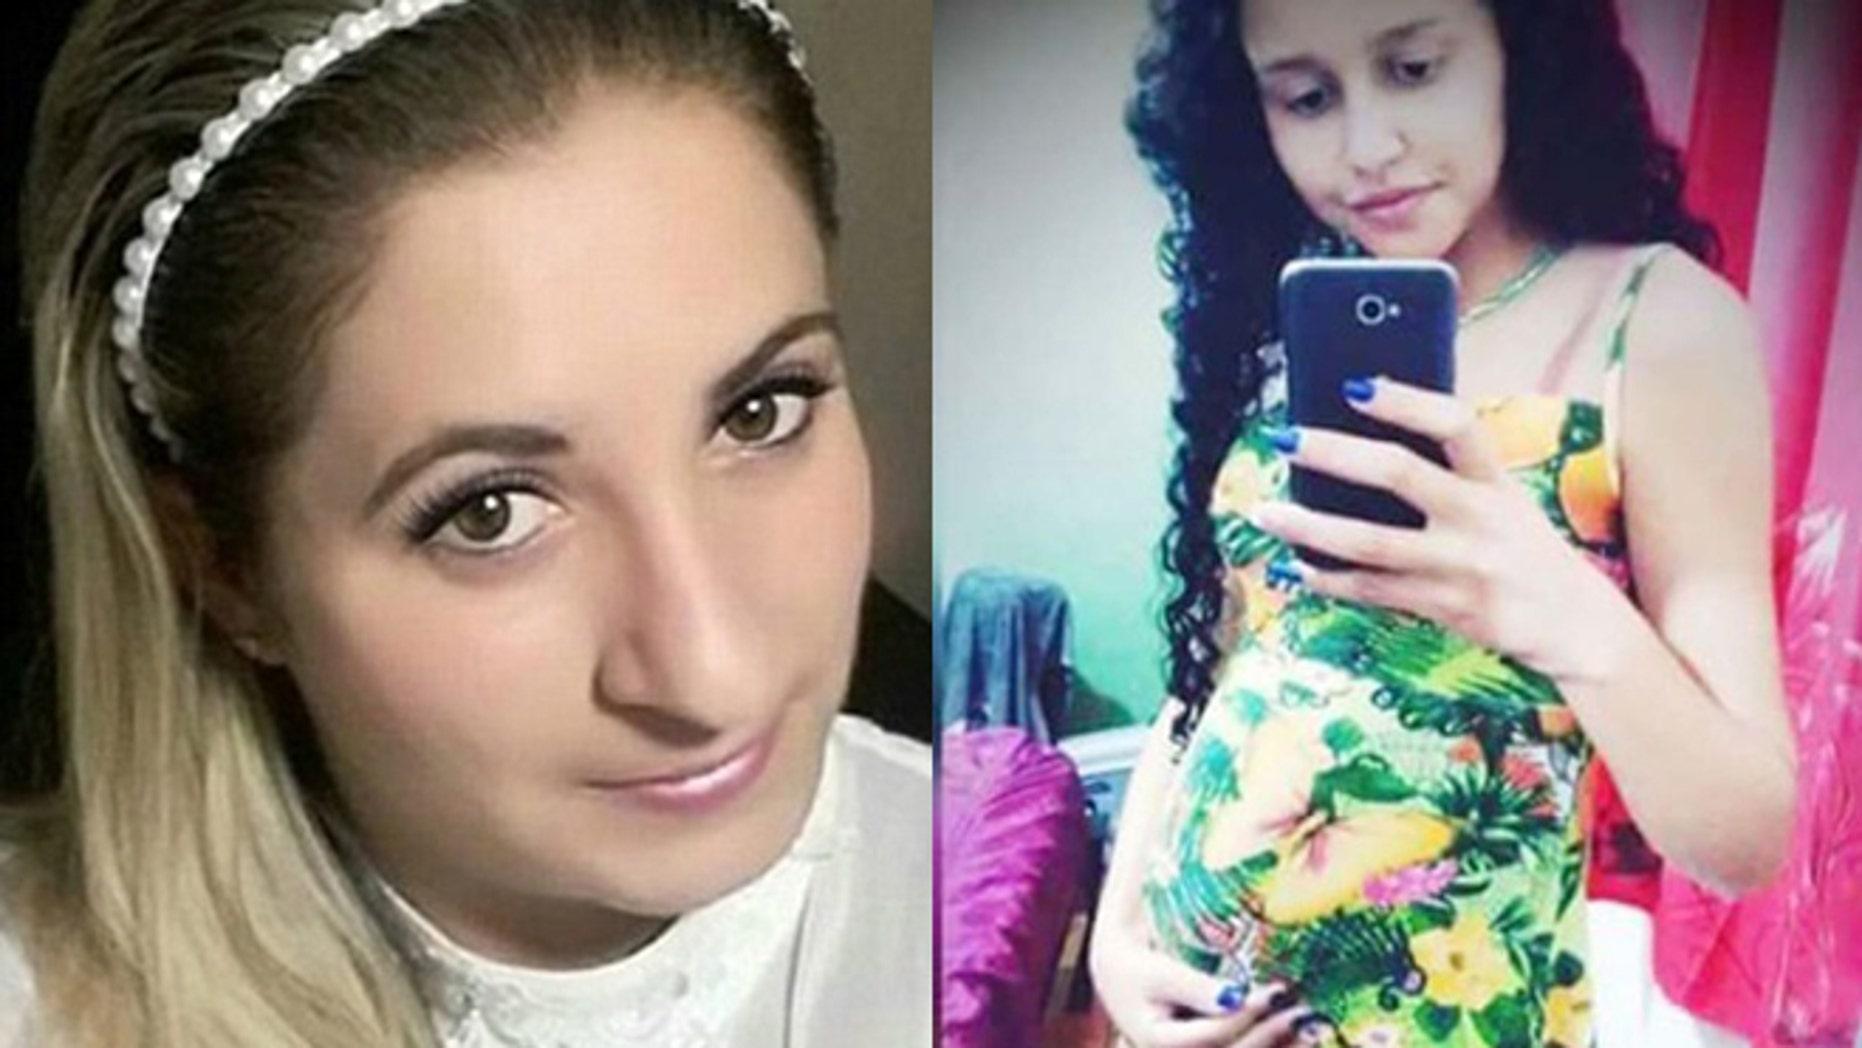 Mirian Siqueria (left) and Valissia Fernandes de Jesus (right). (Photos: via Facebook)